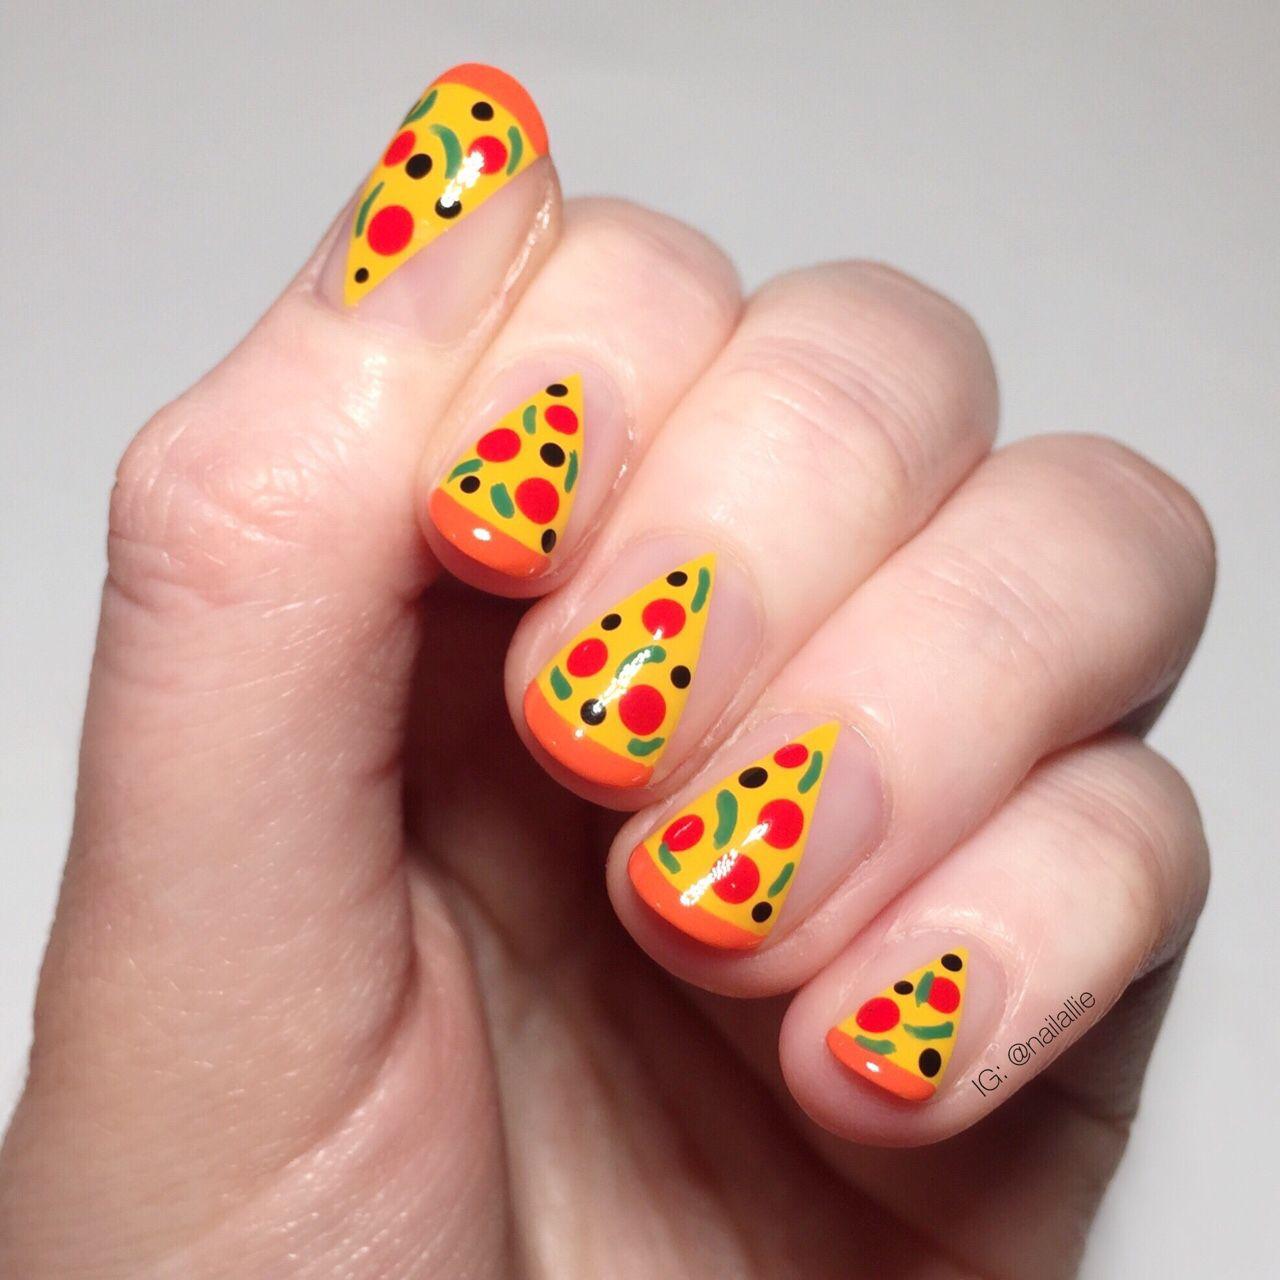 pizza nails | Nails | Pinterest | Pizzas, Hair makeup and Makeup